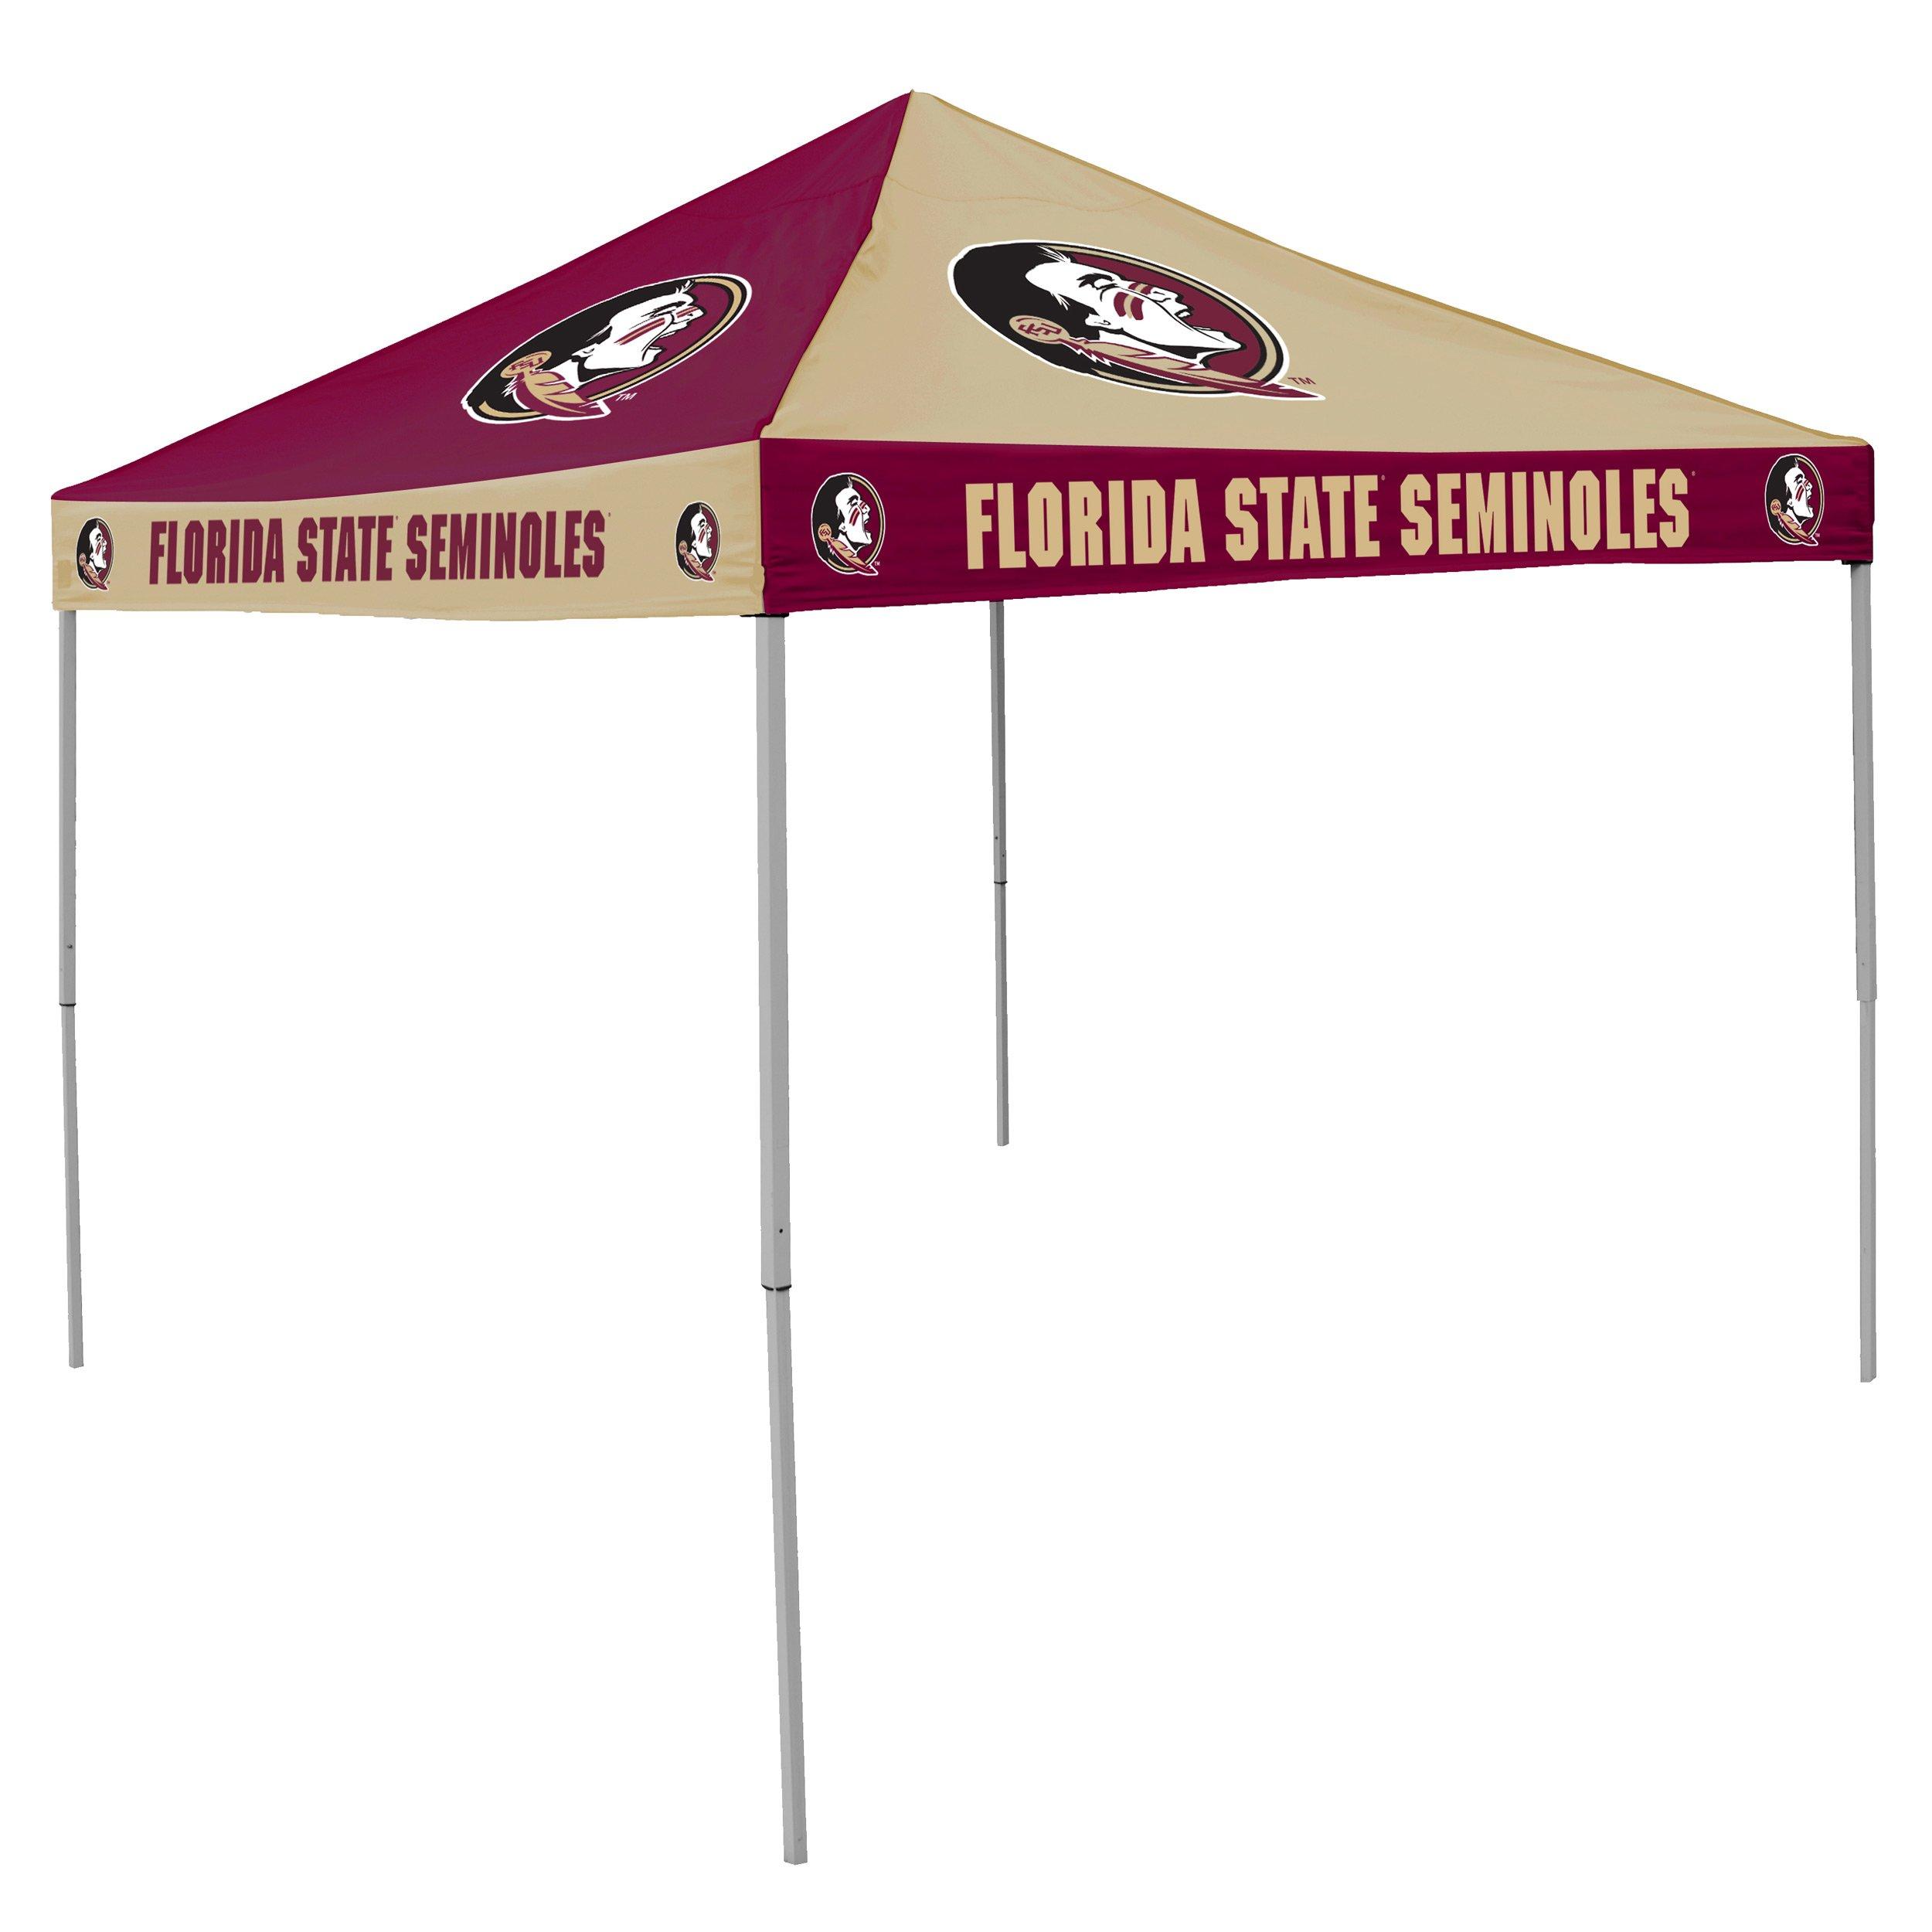 NCAA Florida State Seminoles 9-Foot x 9-Foot Pinwheel Tailgating Canopy, Garnet/Gold by Logo Brands